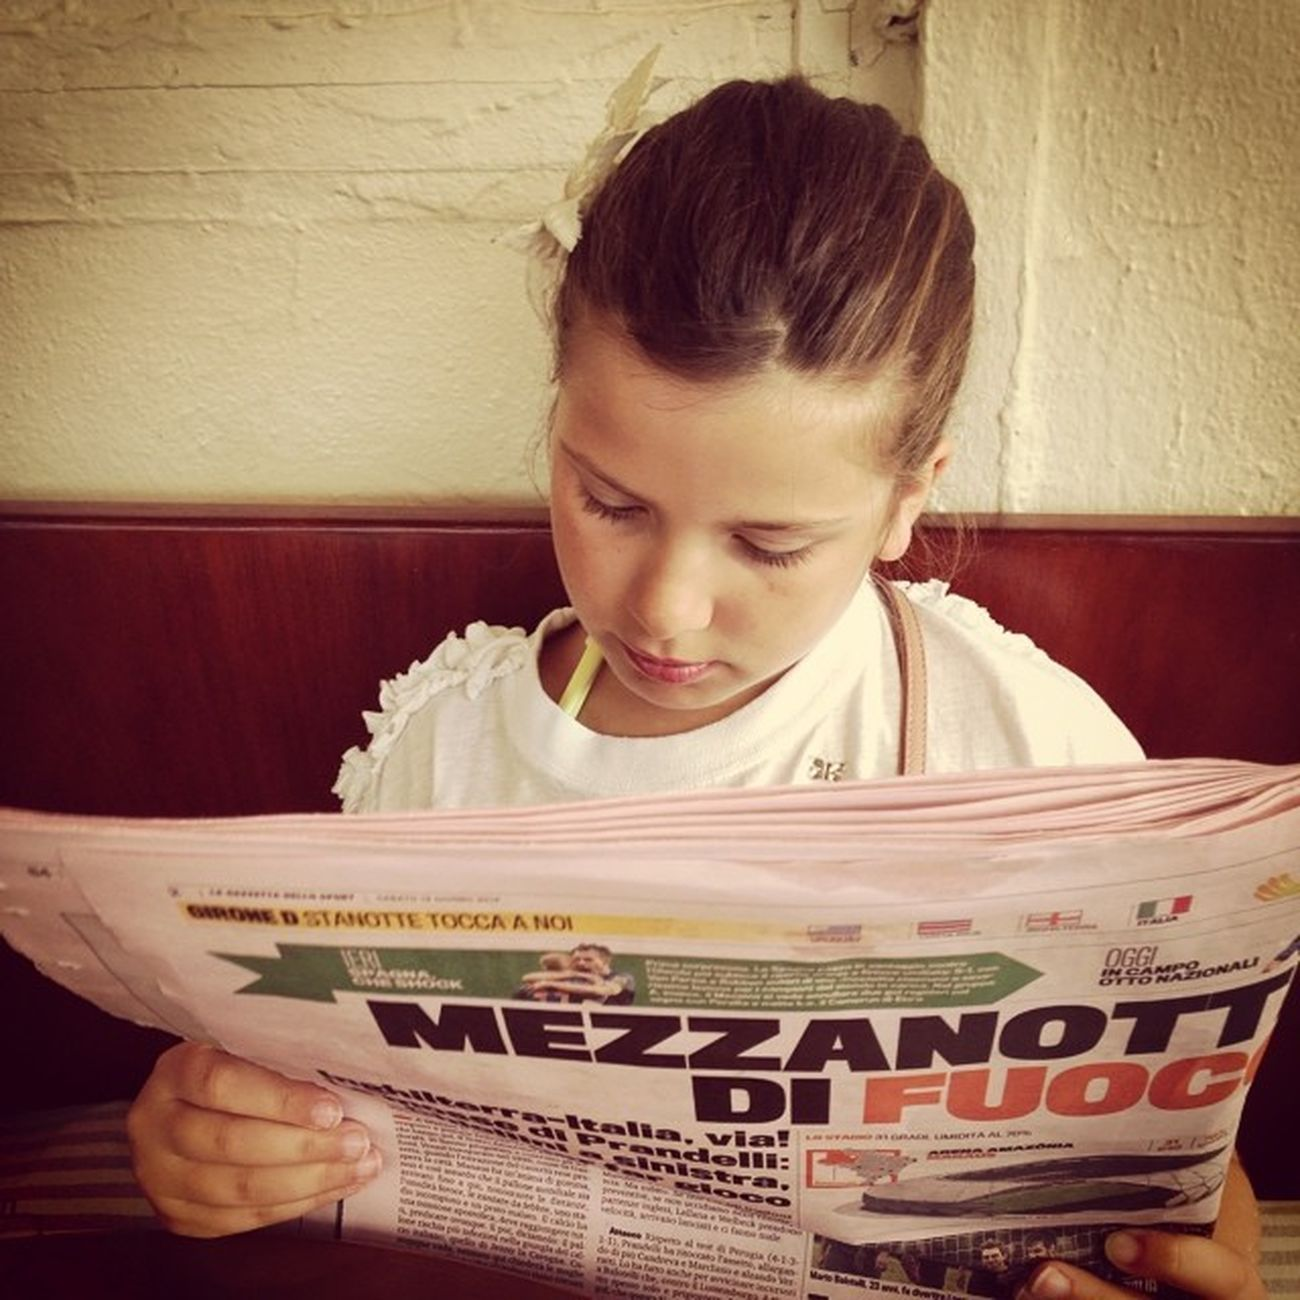 Worldcup Ilovemydaughter Brasil2014 Gazzetta LifeLessOrdinary Mondialibrasile Ameilcalciononpiace